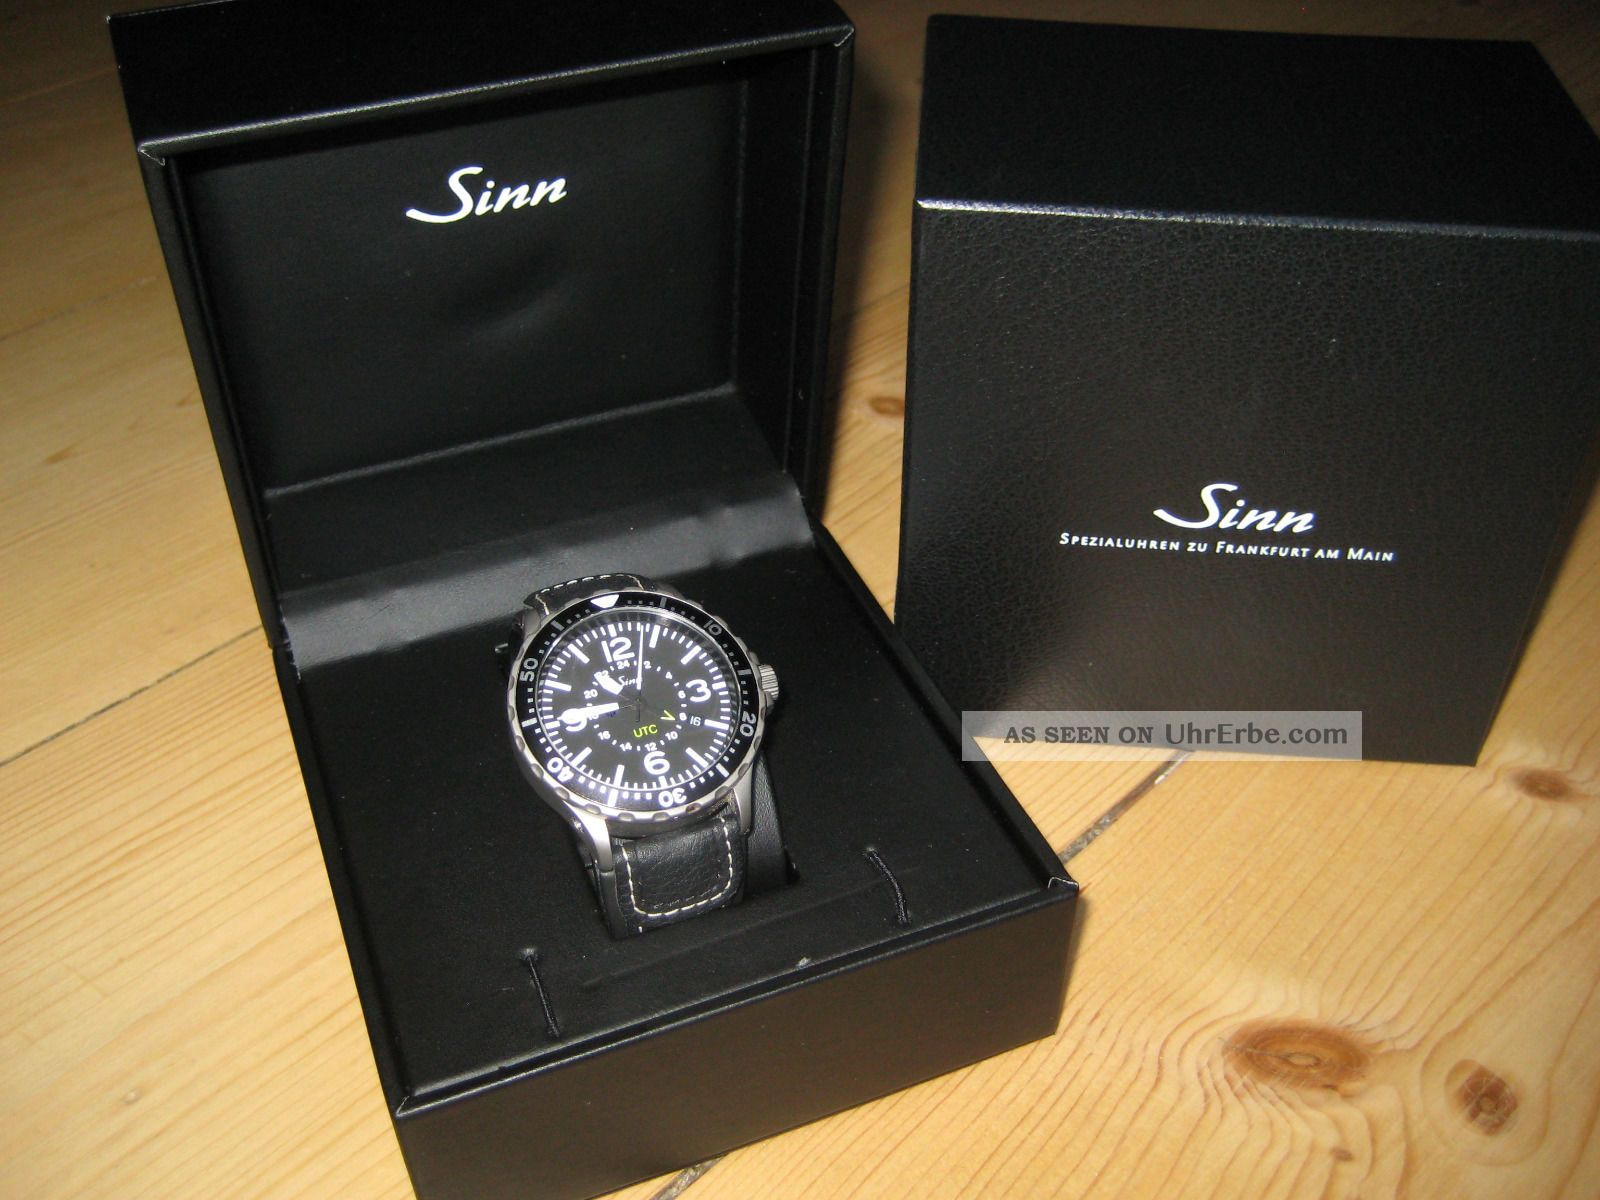 Sinn Automatikuhr 857 Utc - Absolut Neuwertig Armbanduhren Bild